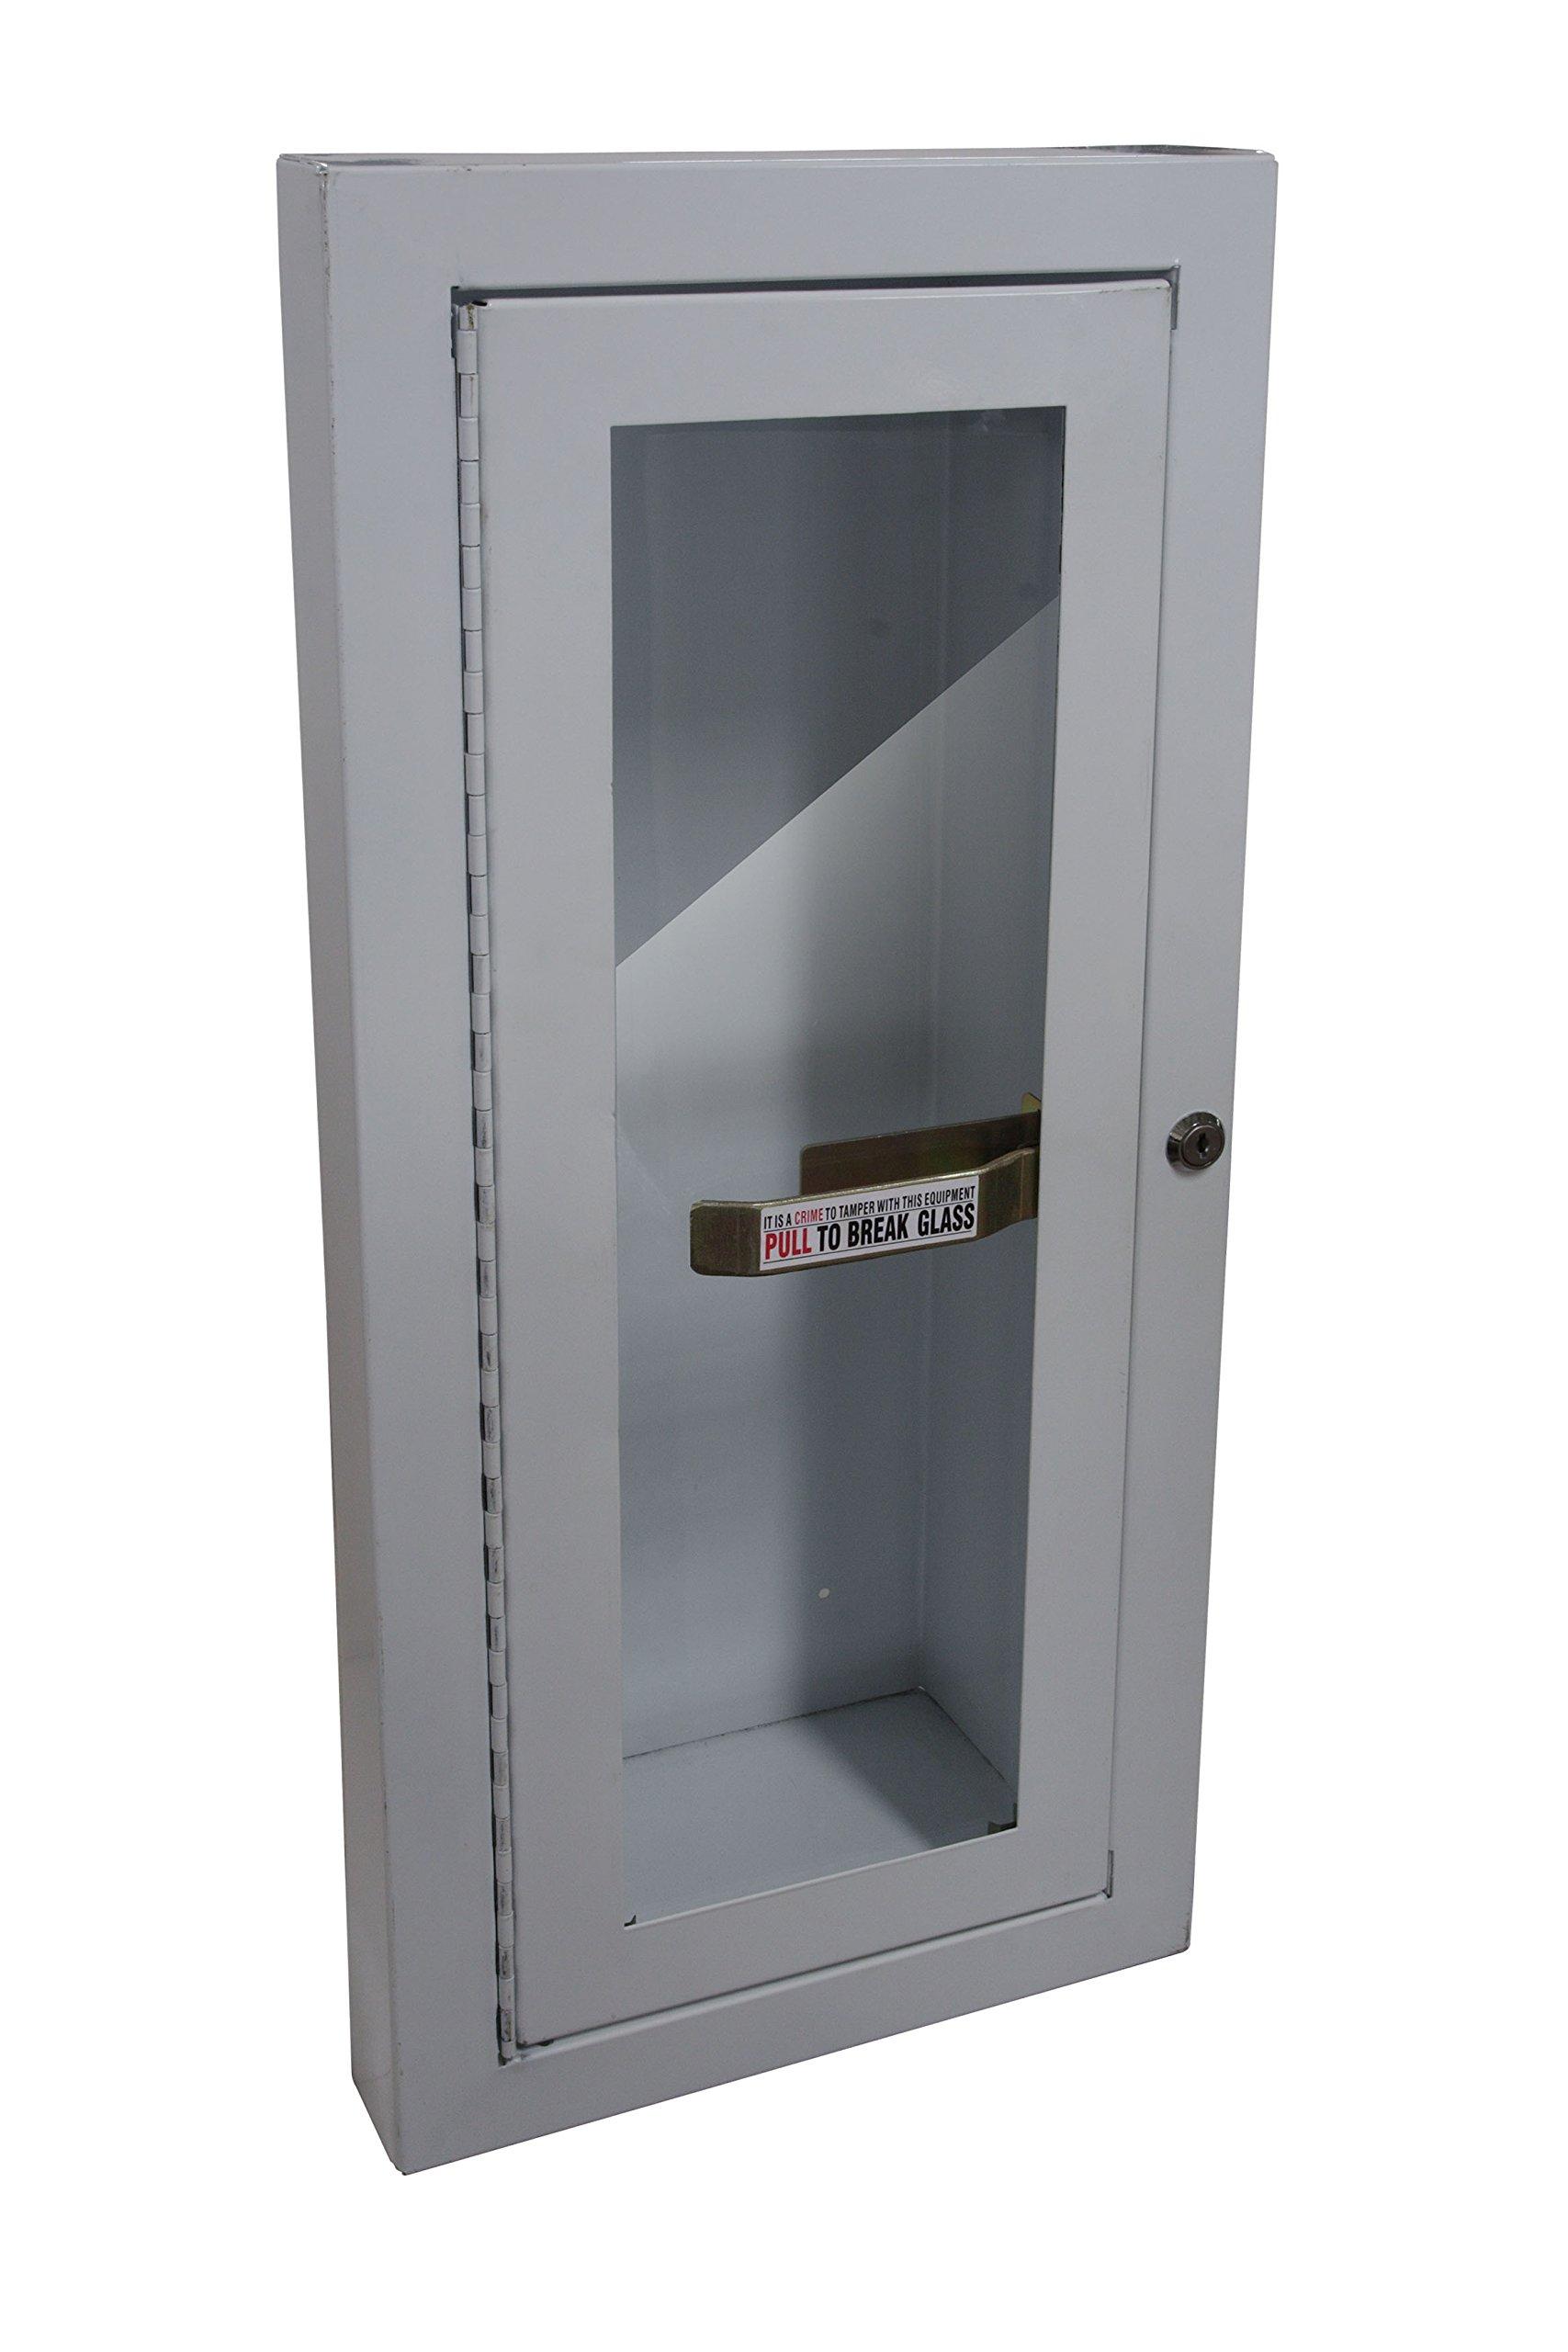 Sandusky Lee 8012-9 Fire Extinguisher Cabinet, Semi Recessed, 5 lb, White